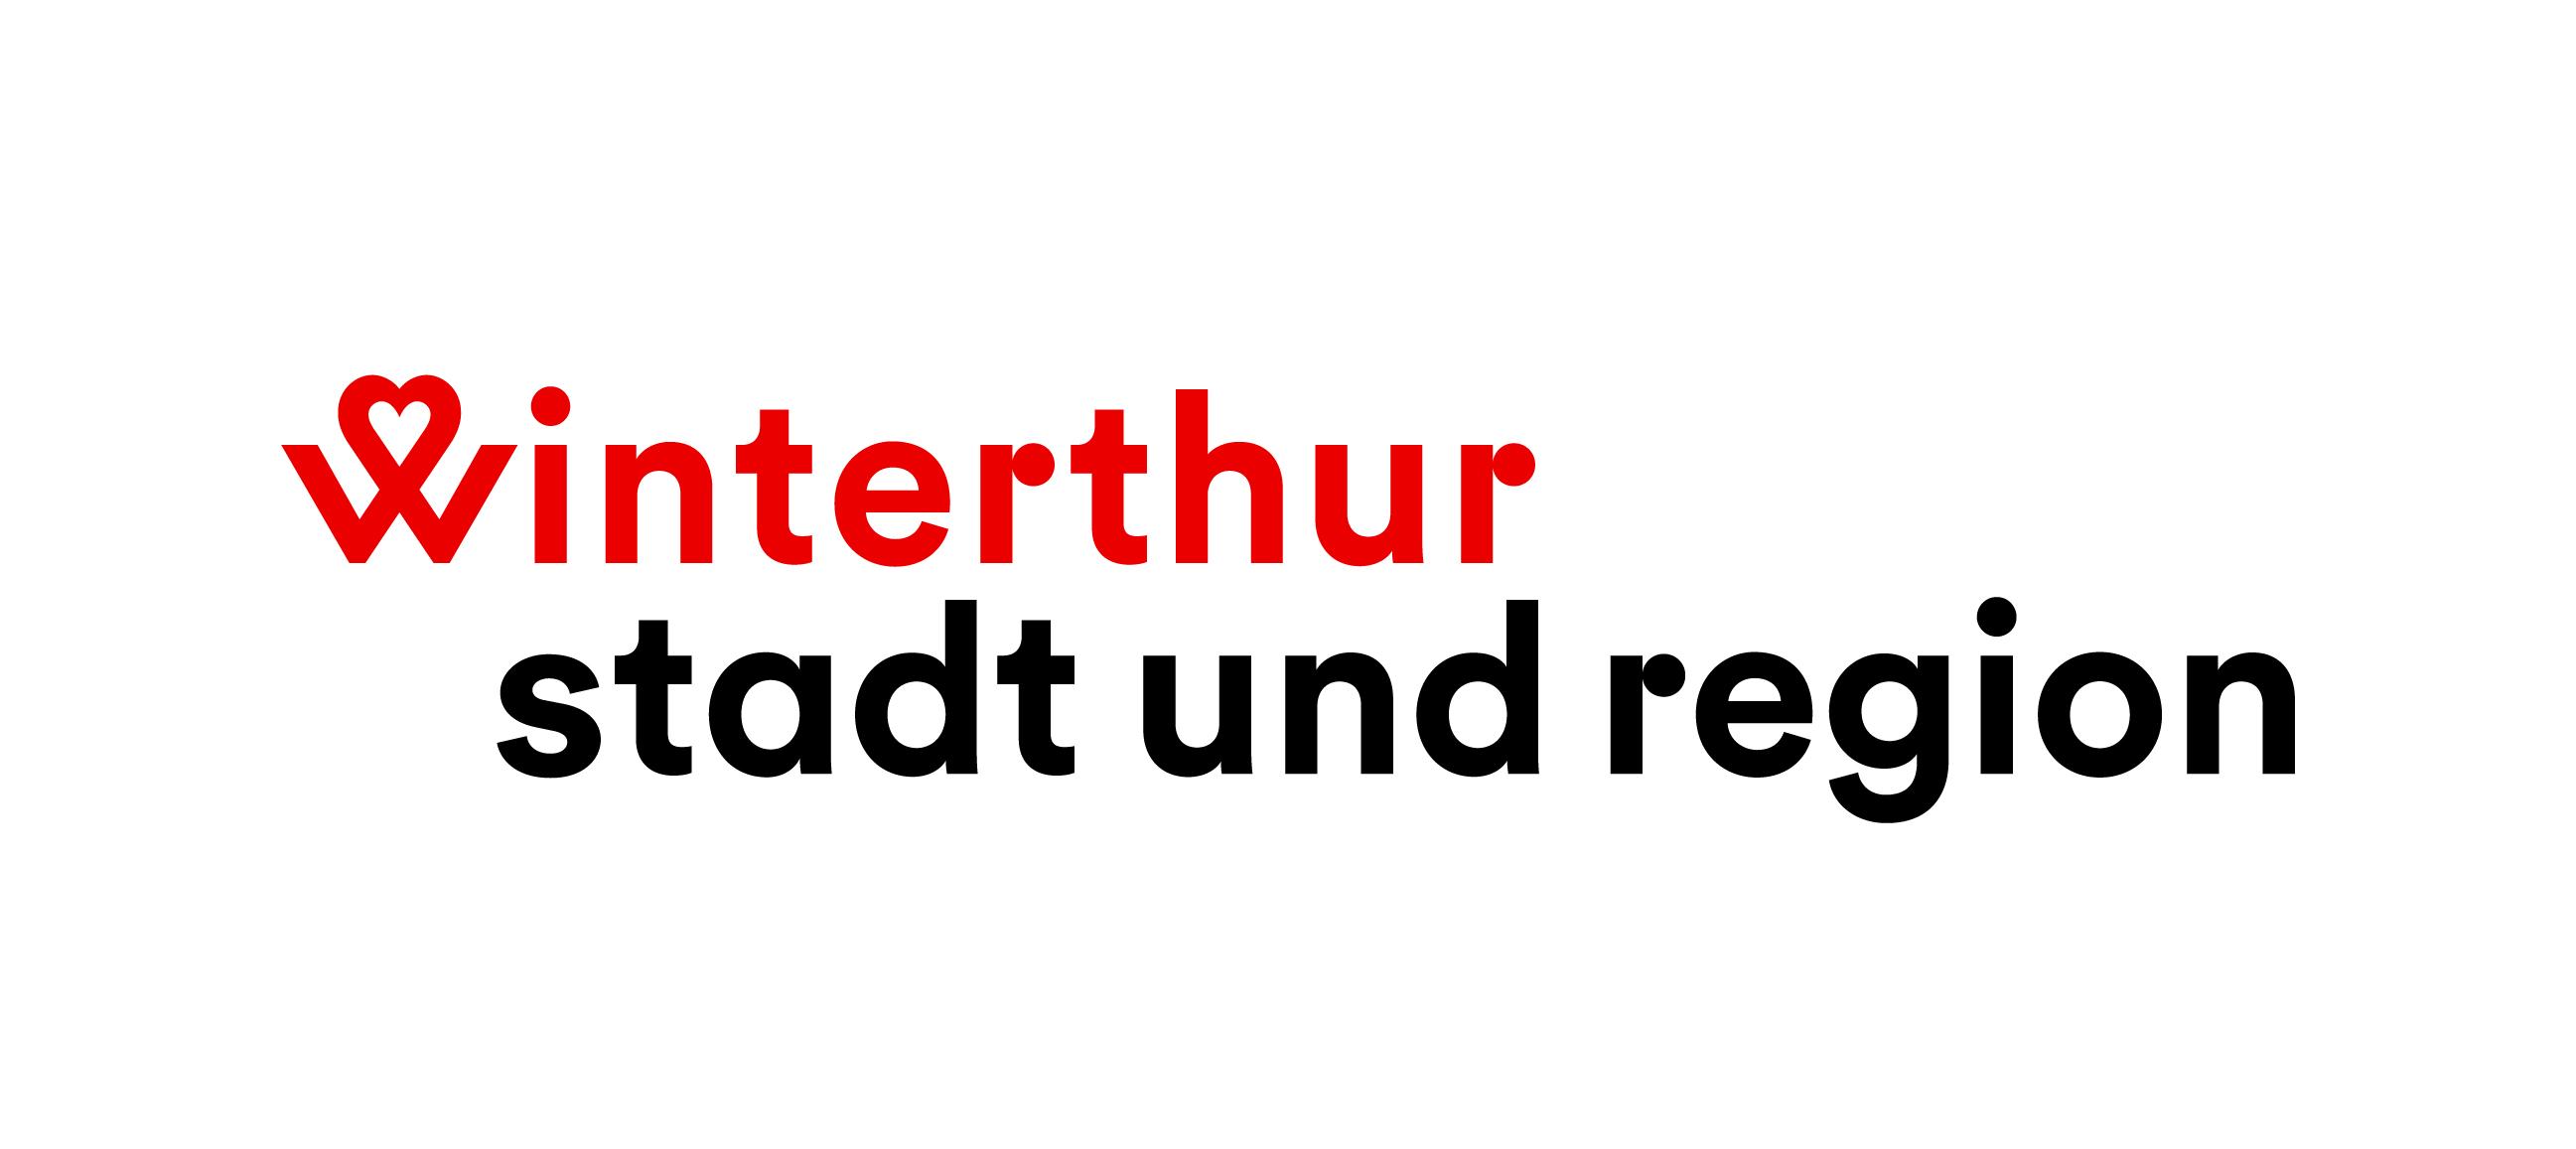 House_of_Winterthur